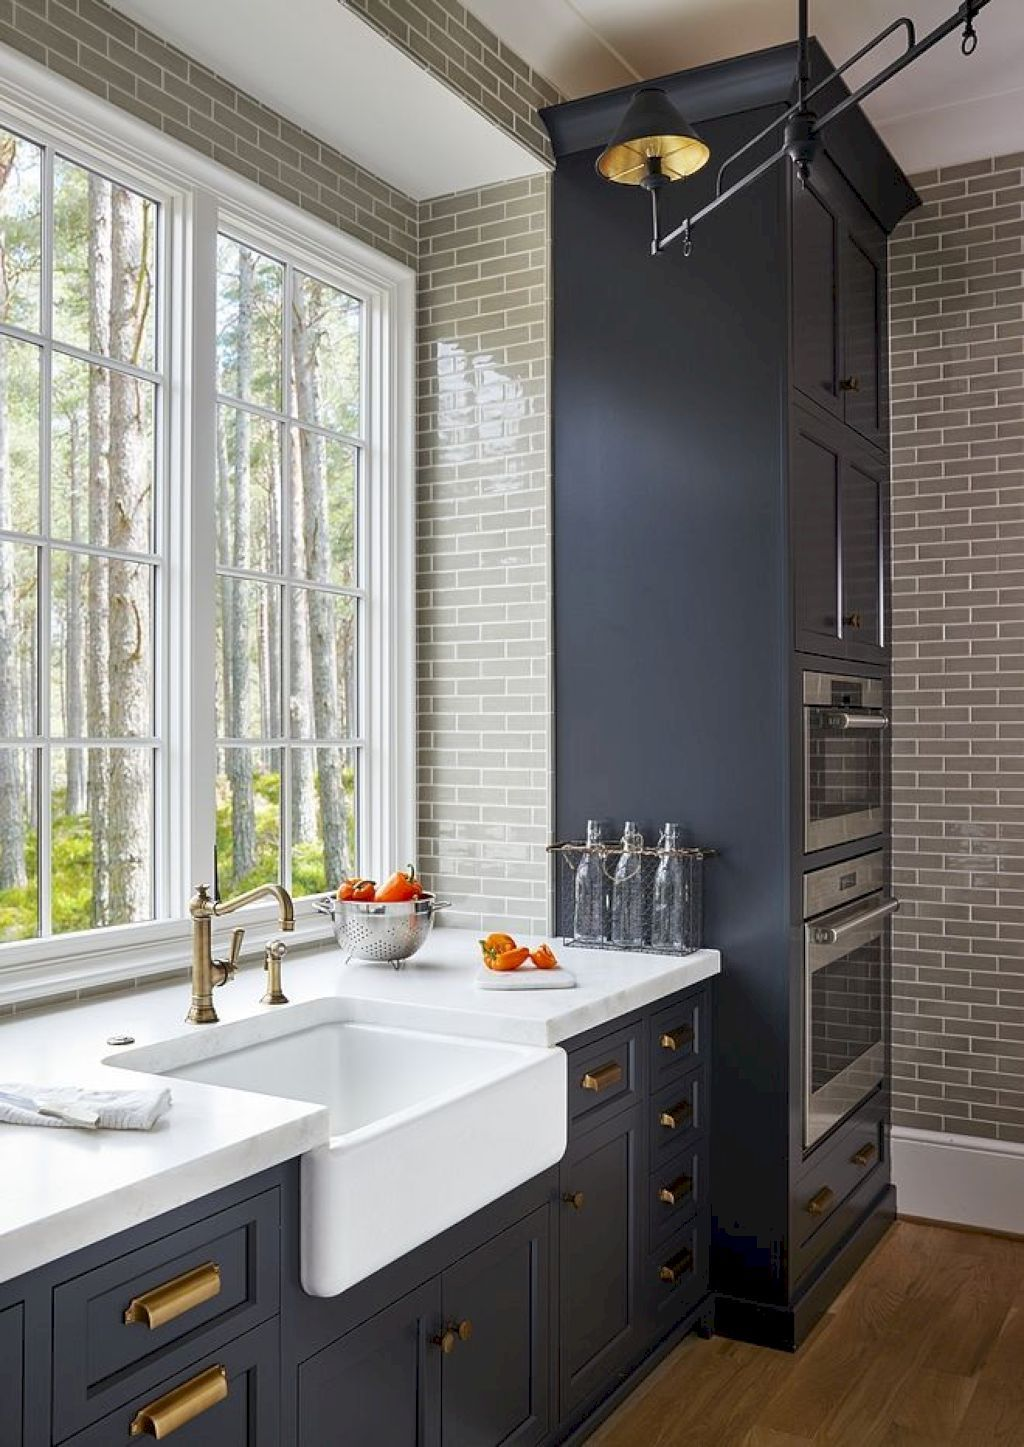 110 awesome kitchen backsplash remodel ideas home kitchen decor rh pinterest com